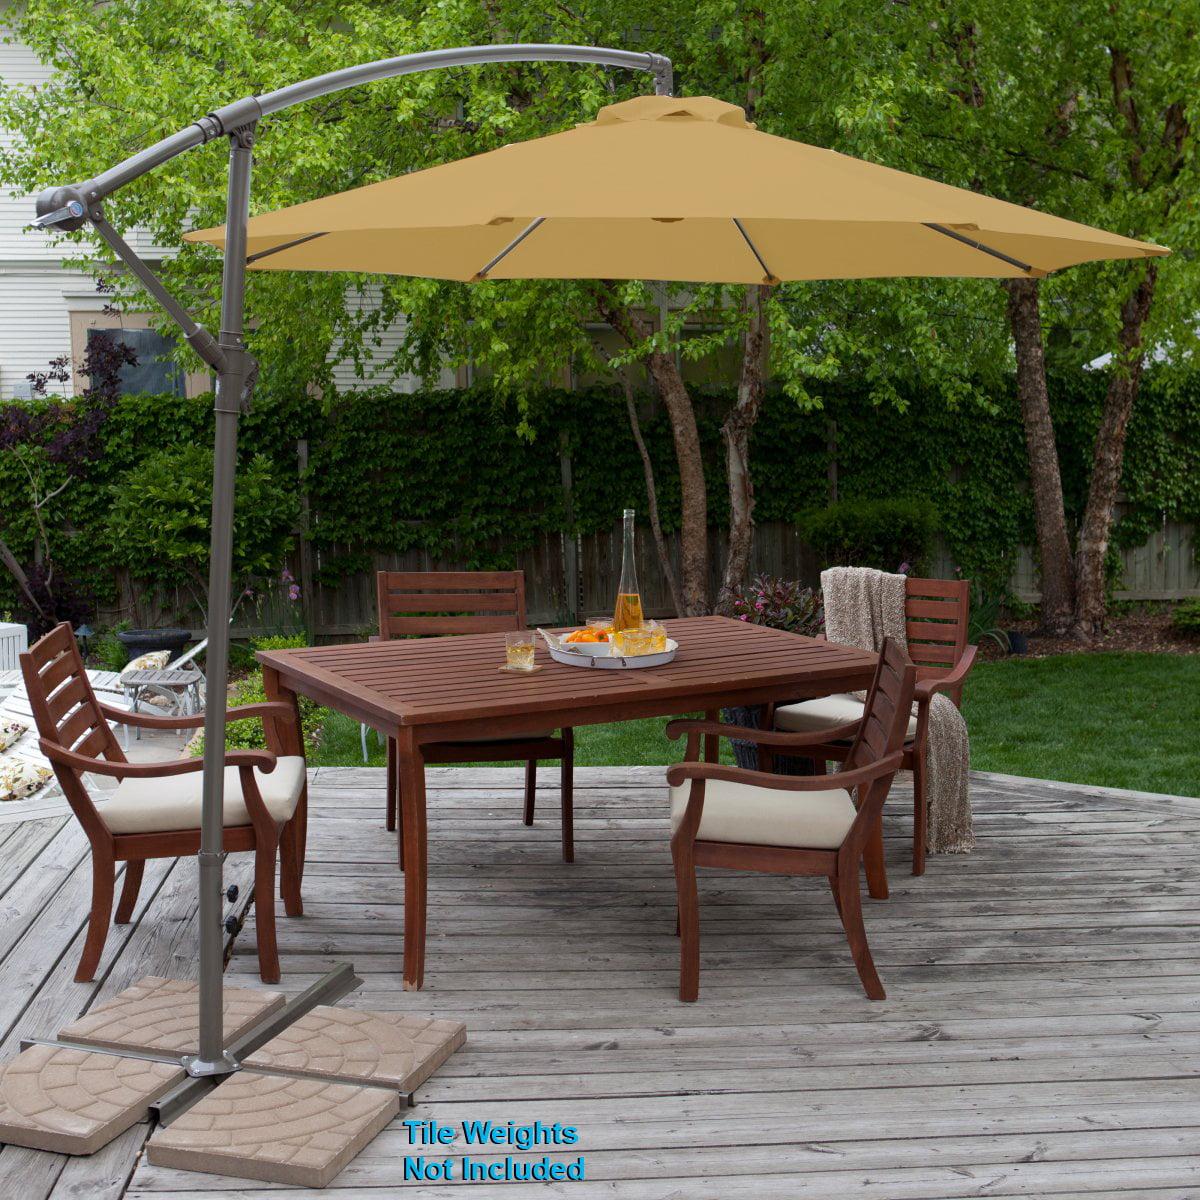 Clevr 10ft Offset Umbrella Outdoor Deck Patio Tilt Cantilever Hanging Canopy Tan